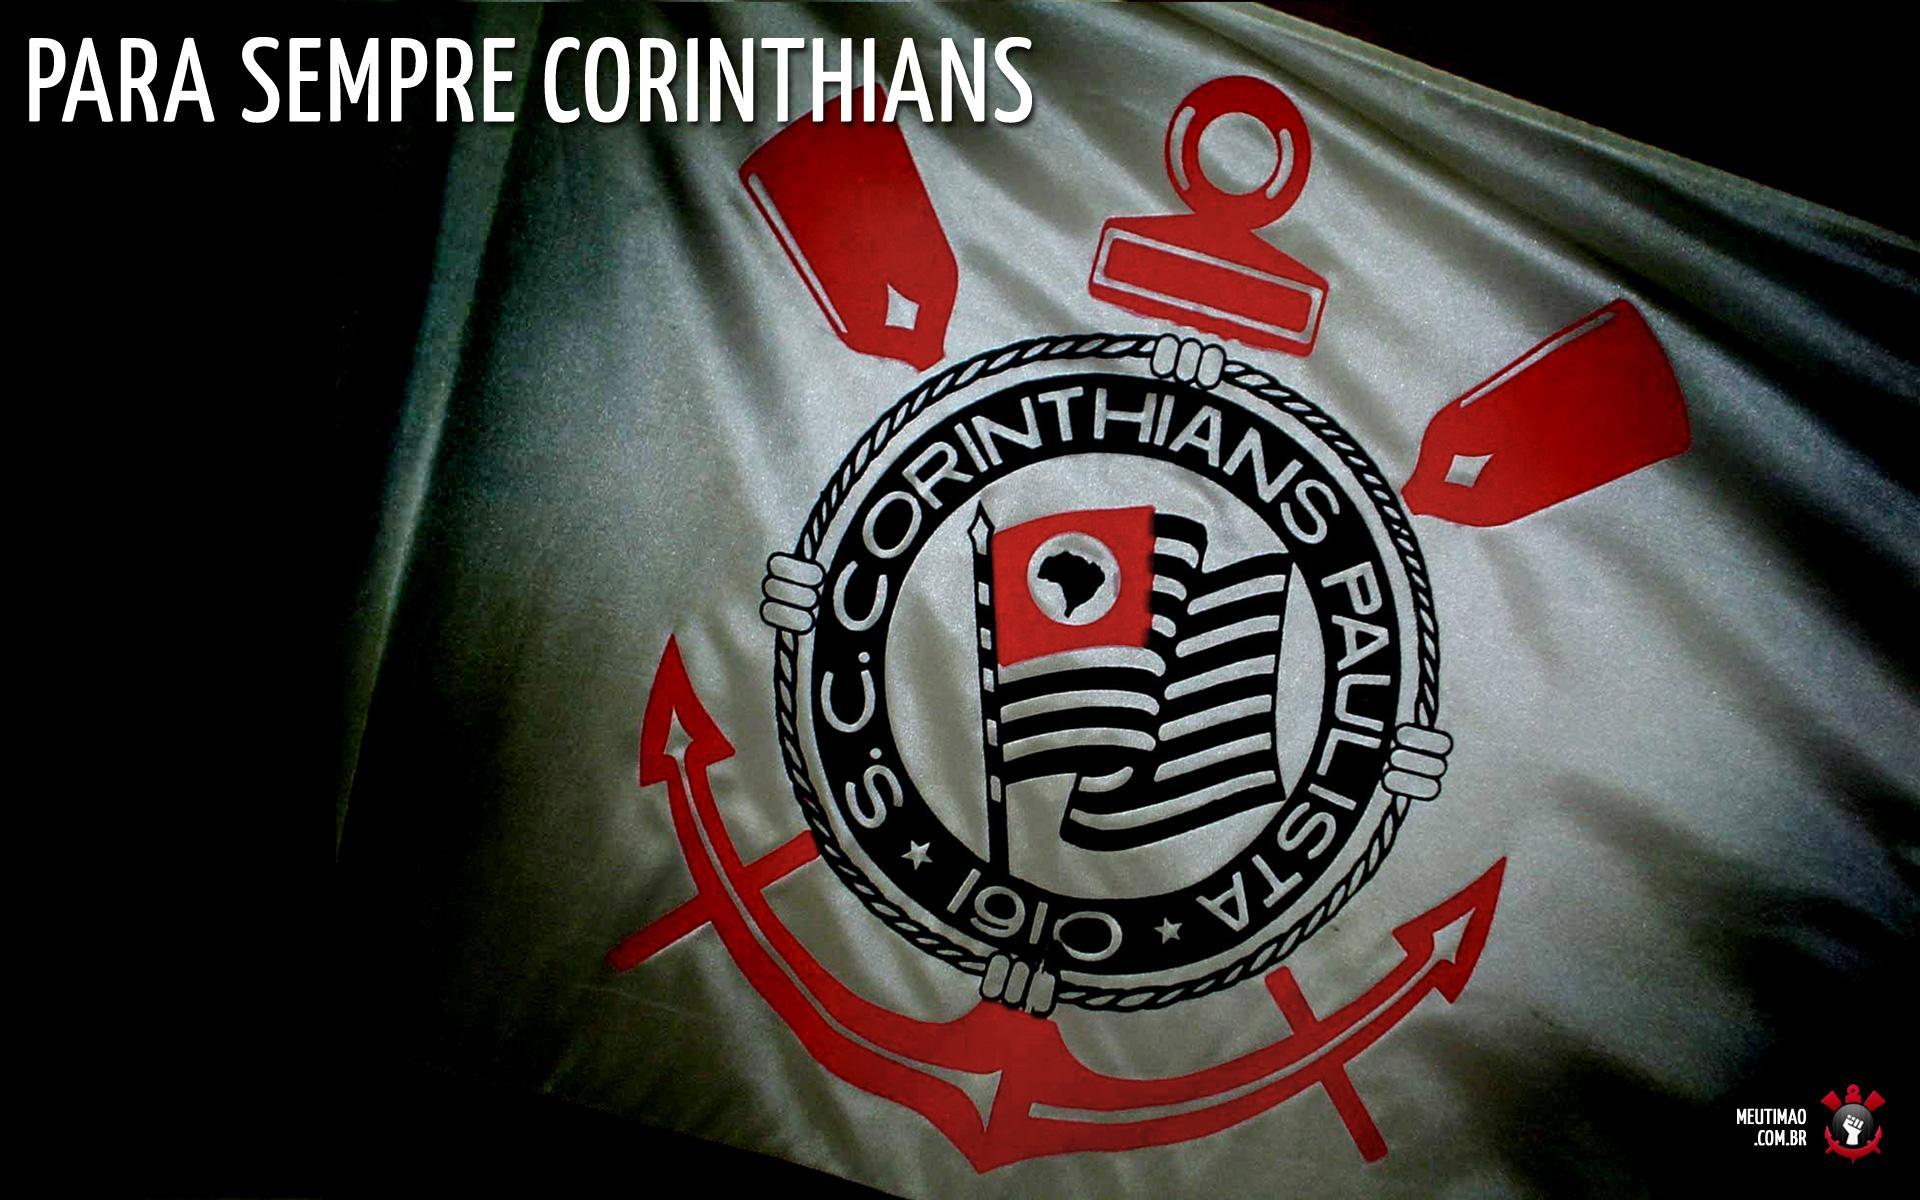 Fotos Corinthians ~ Wallpaper do Corinthians Arena Corinthians em HD